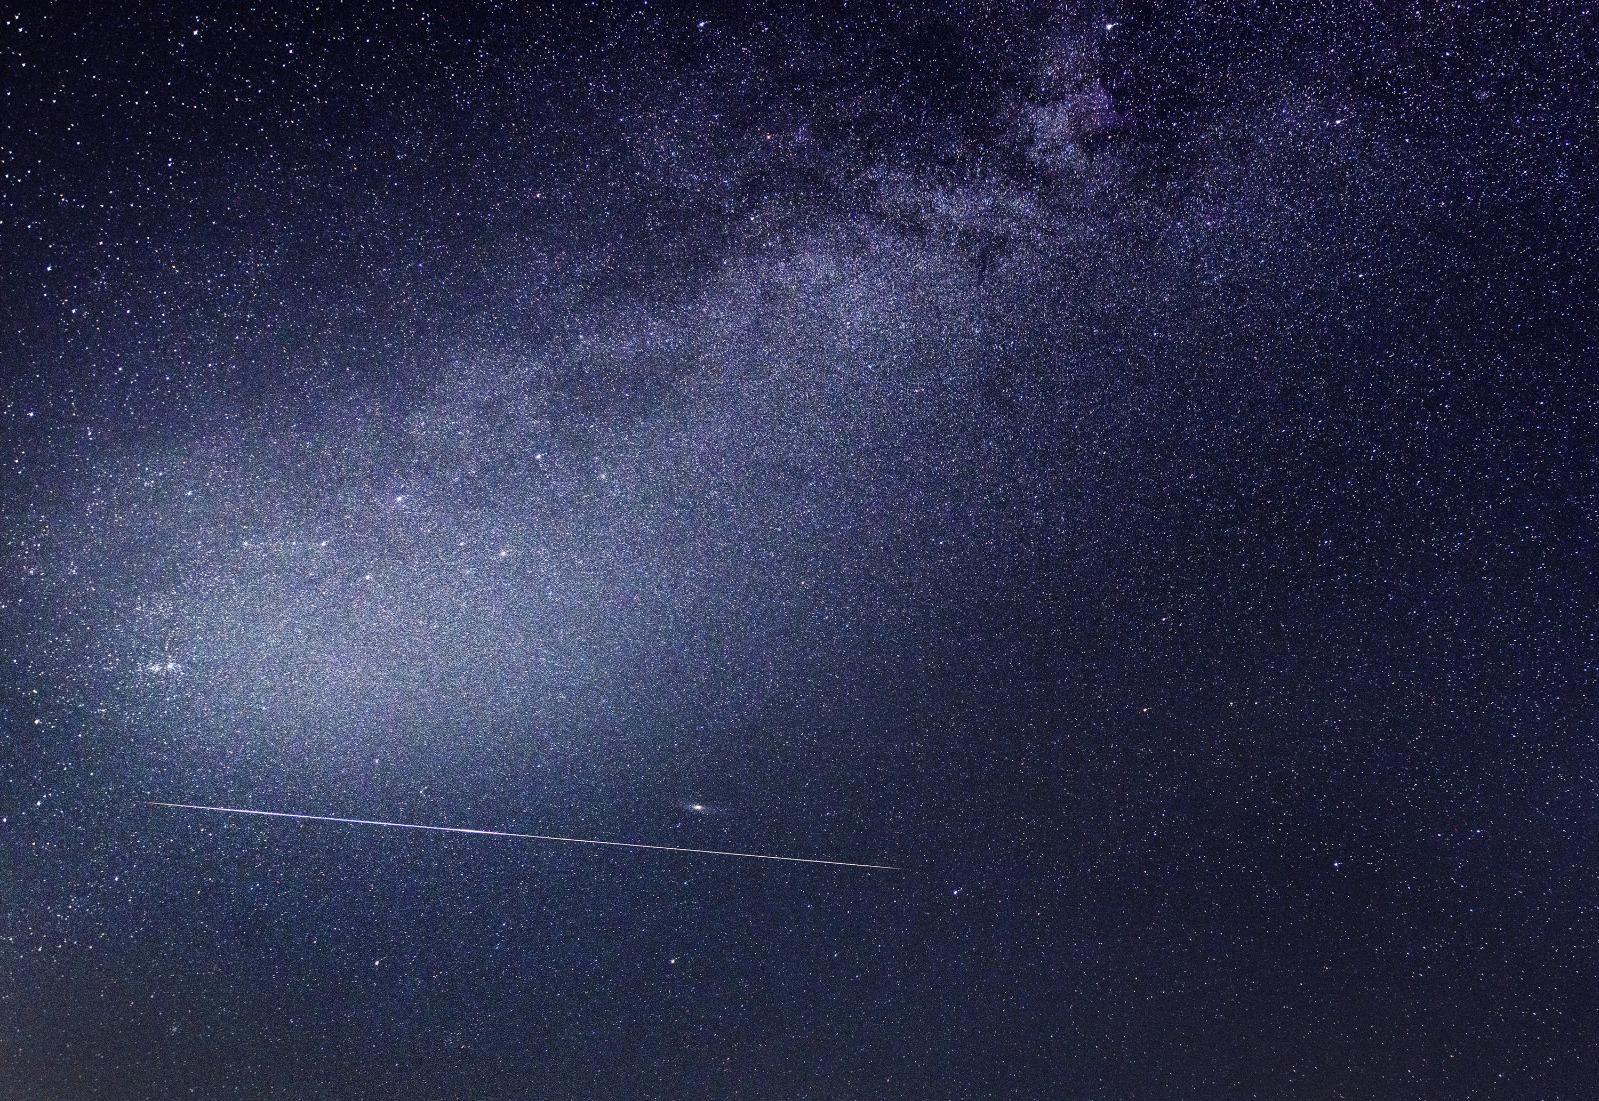 Meteor shower Dmugħ ta' San Lawrenz to shine in dark night sky